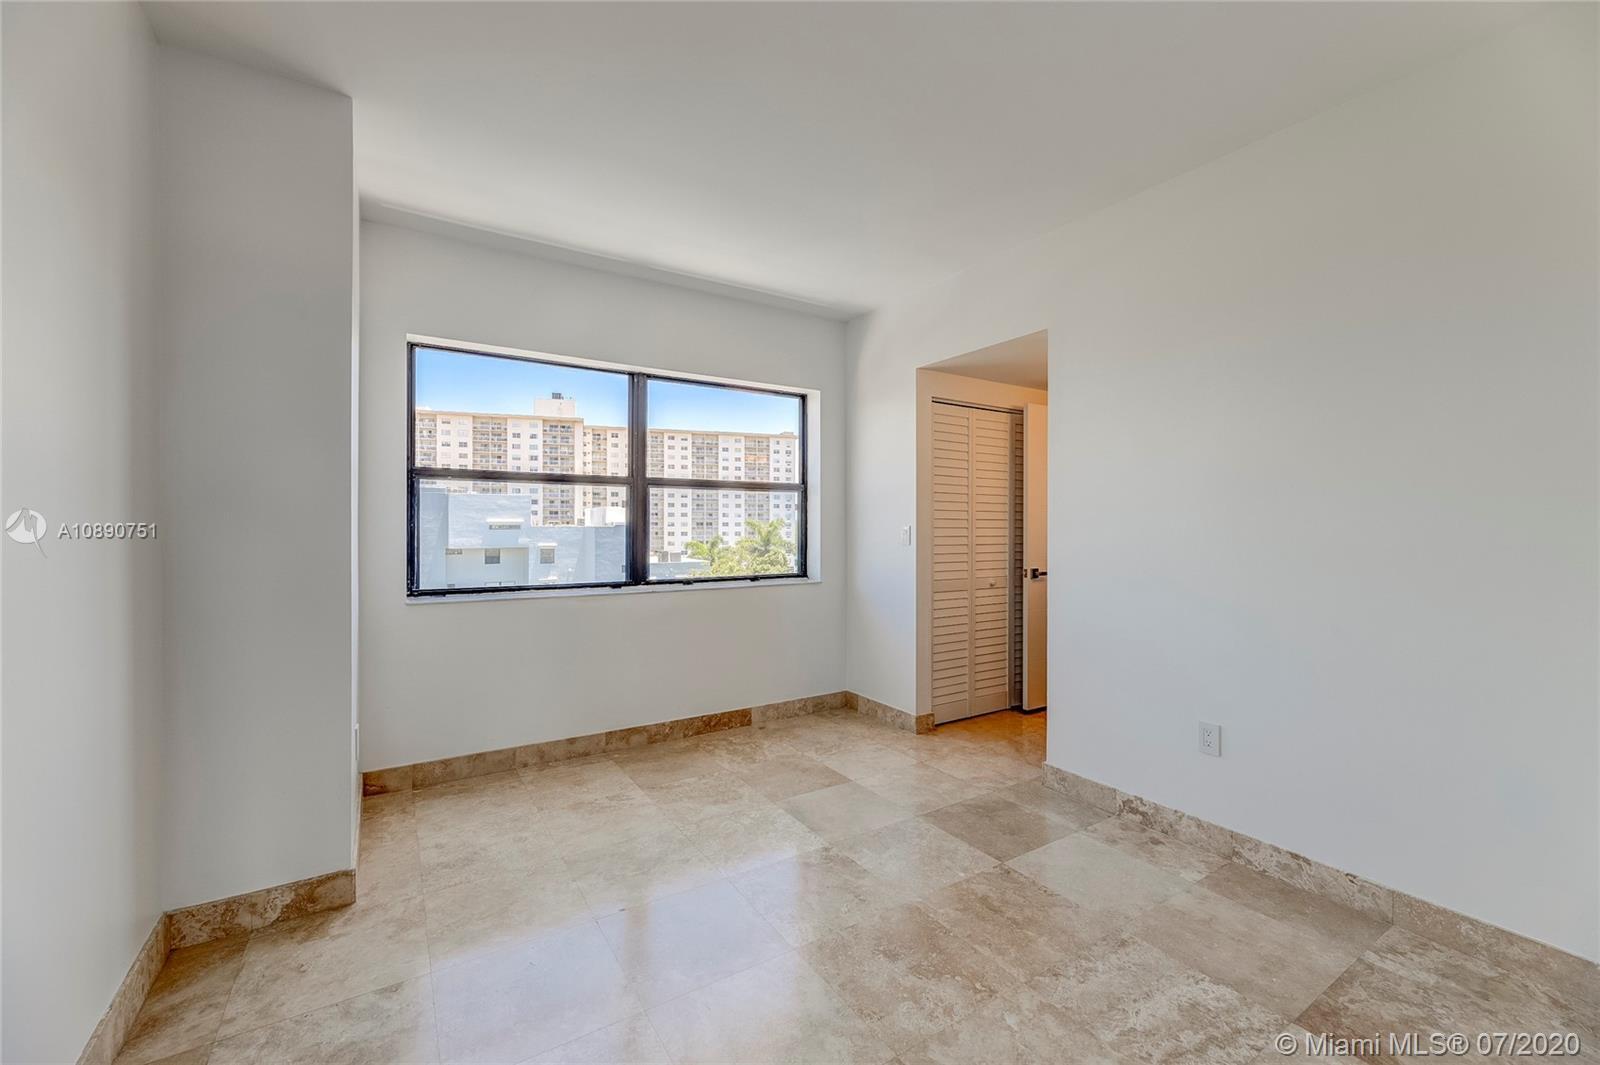 Photo of 425 Poinciana Island Drive #1444, Sunny Isles Beach, Florida, 33160 - Generous walk in closet in primary bedroom